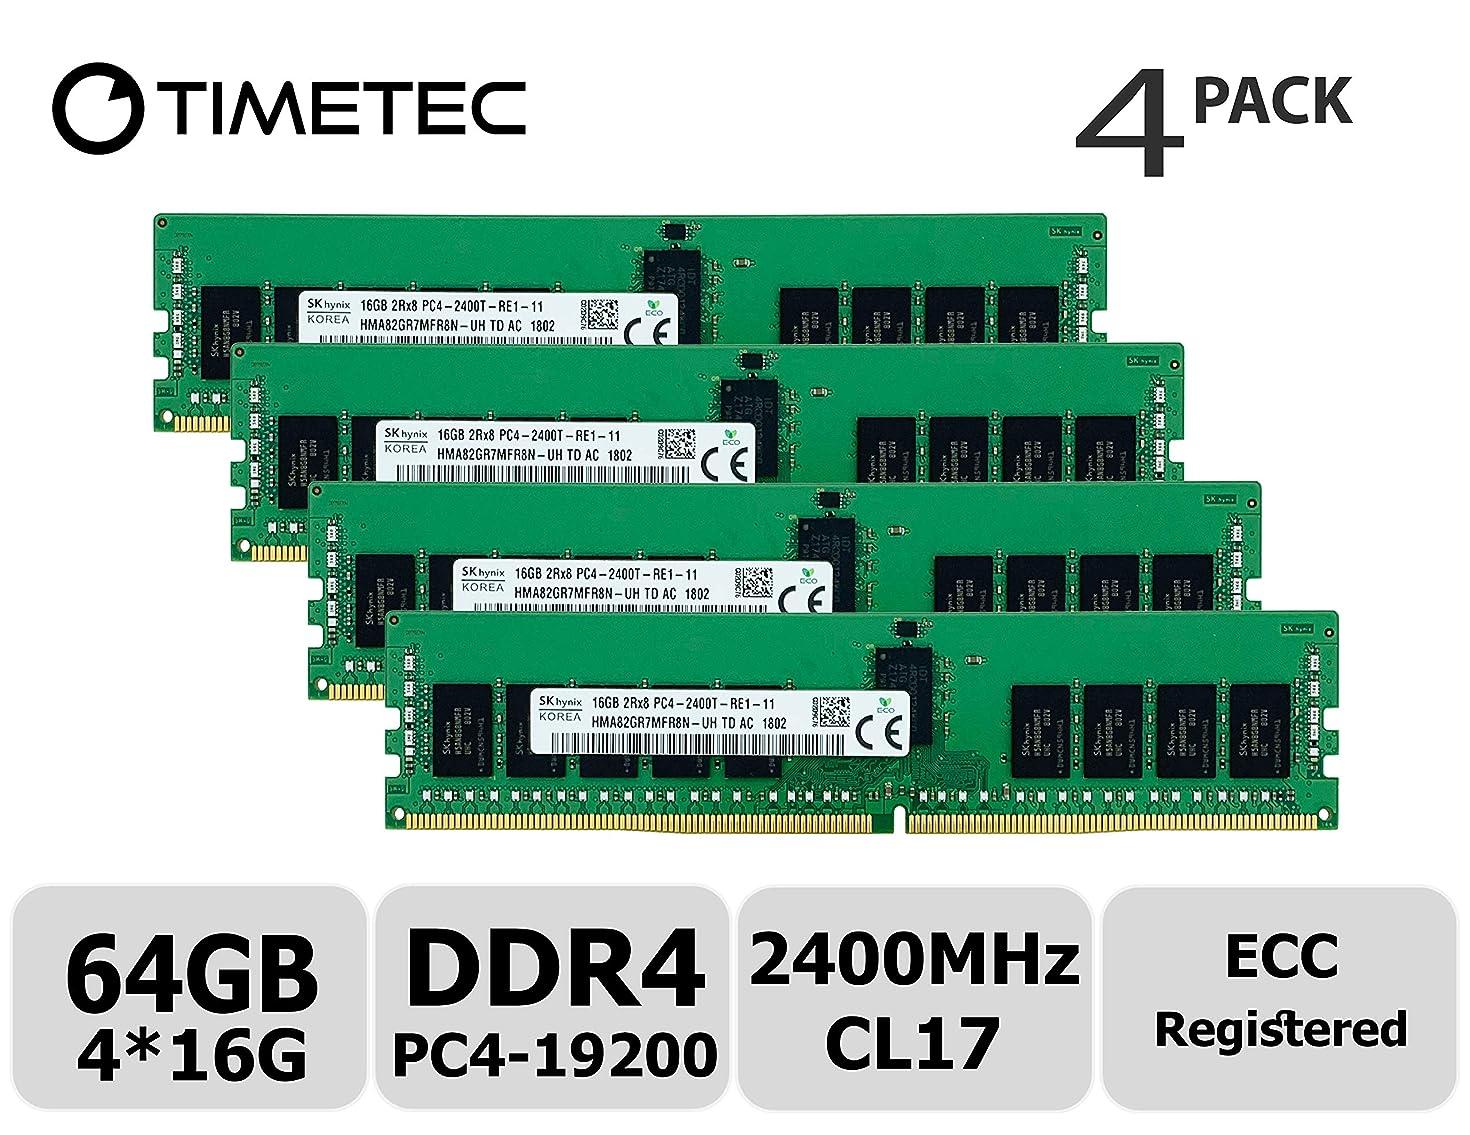 Timetec Hynix Original 64GB KIT(4x16GB) DDR4 2400MHz PC4-19200 Registered ECC 1.2V CL17 2Rx8 Dual Rank 288 Pin RDIMM Server Memory RAM Module Upgrade (64GB KIT(4x16GB))